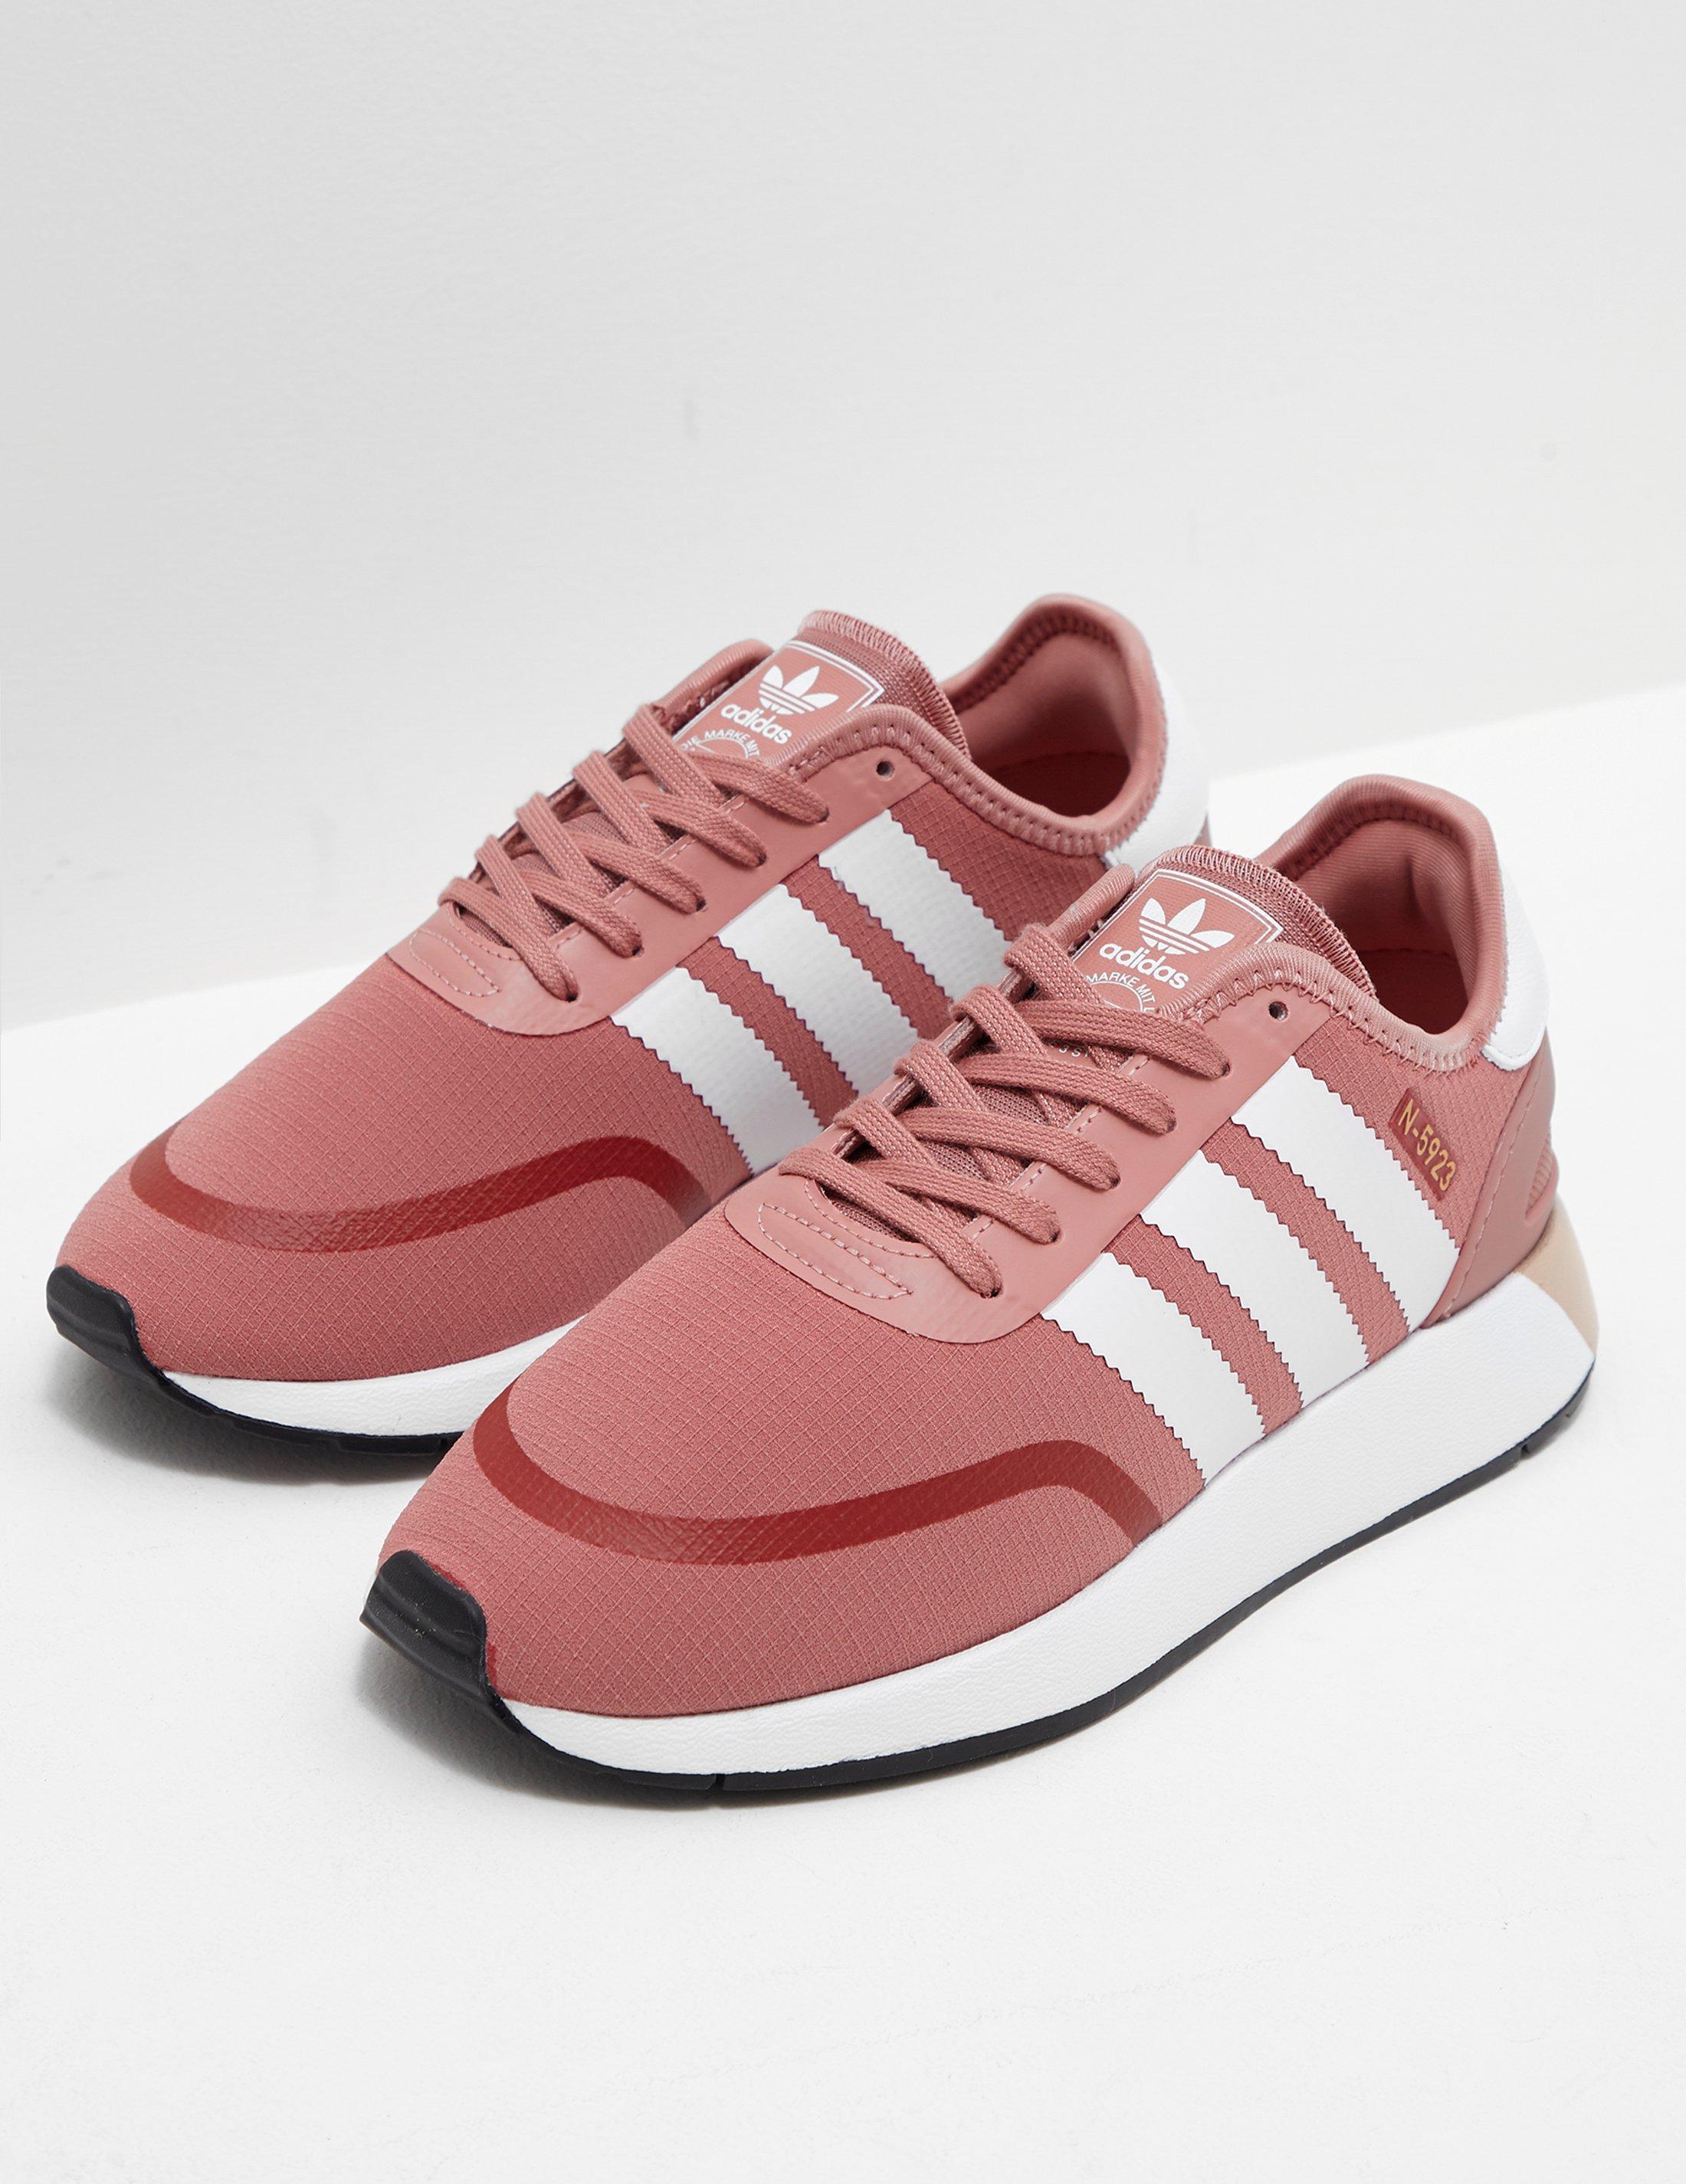 d6c1a83b5dd adidas Originals Womens N-5923 Women s Pink in Pink - Lyst